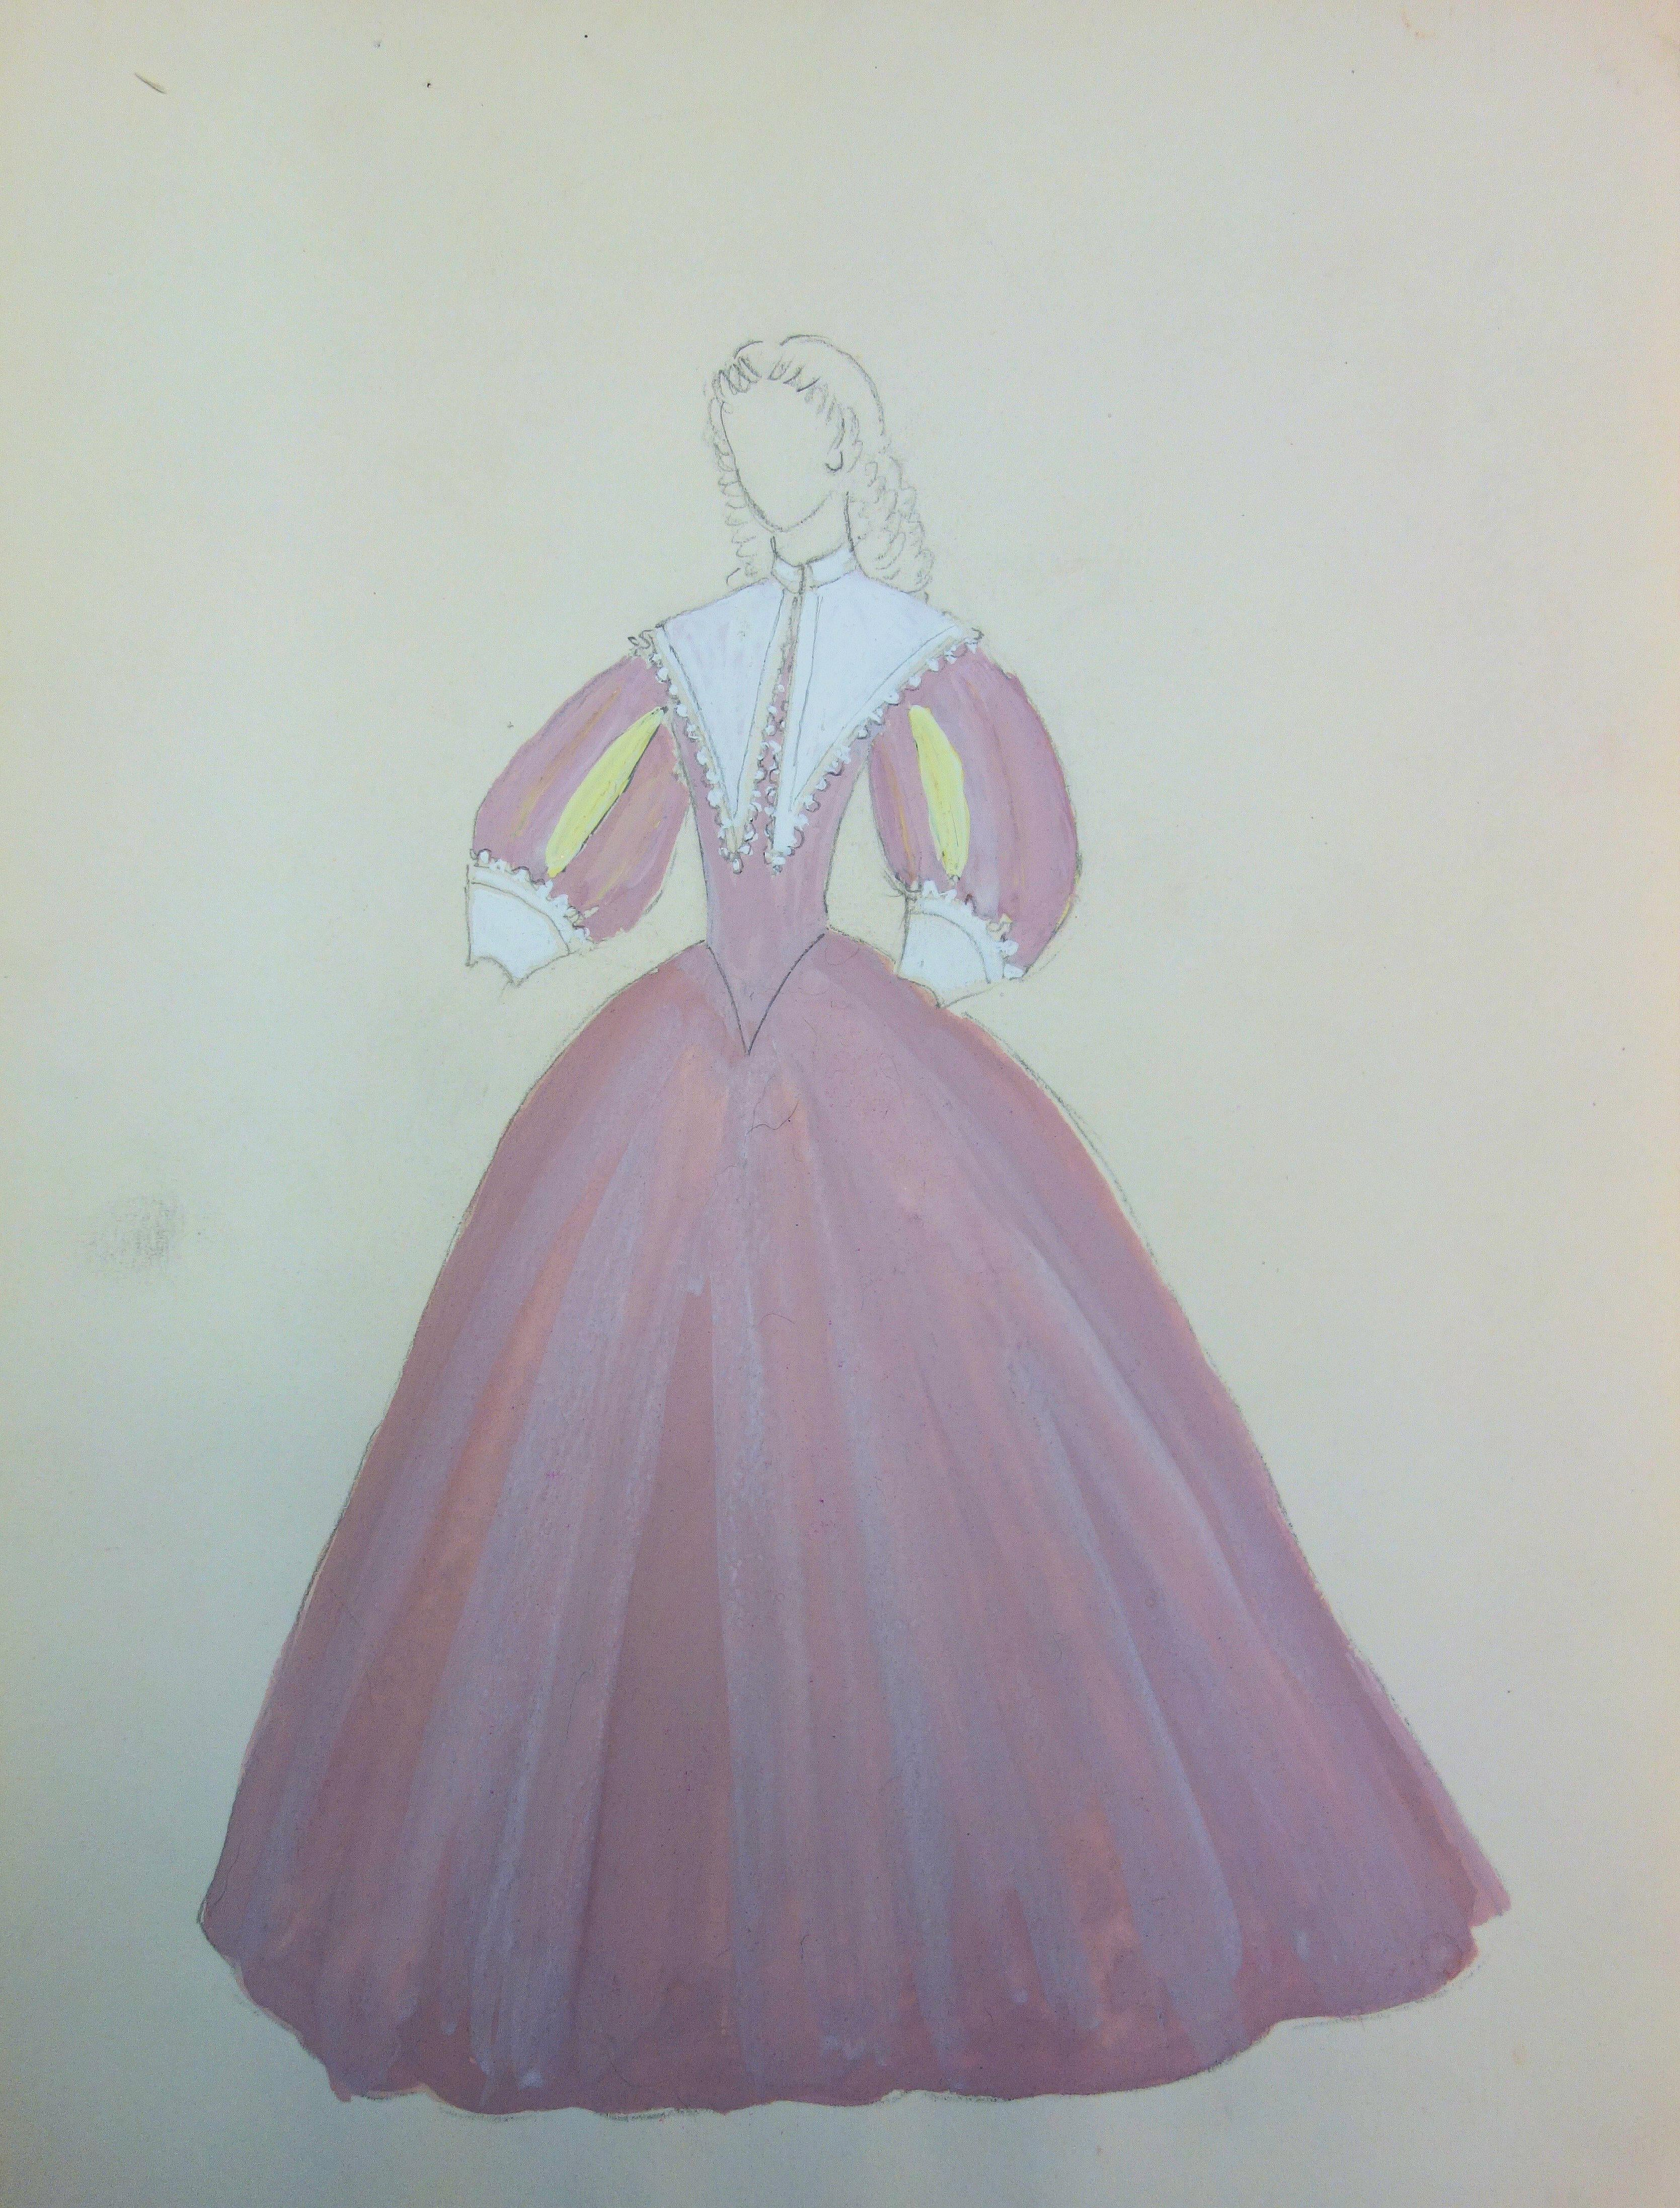 Baroque Pink Dress - Original watercolor